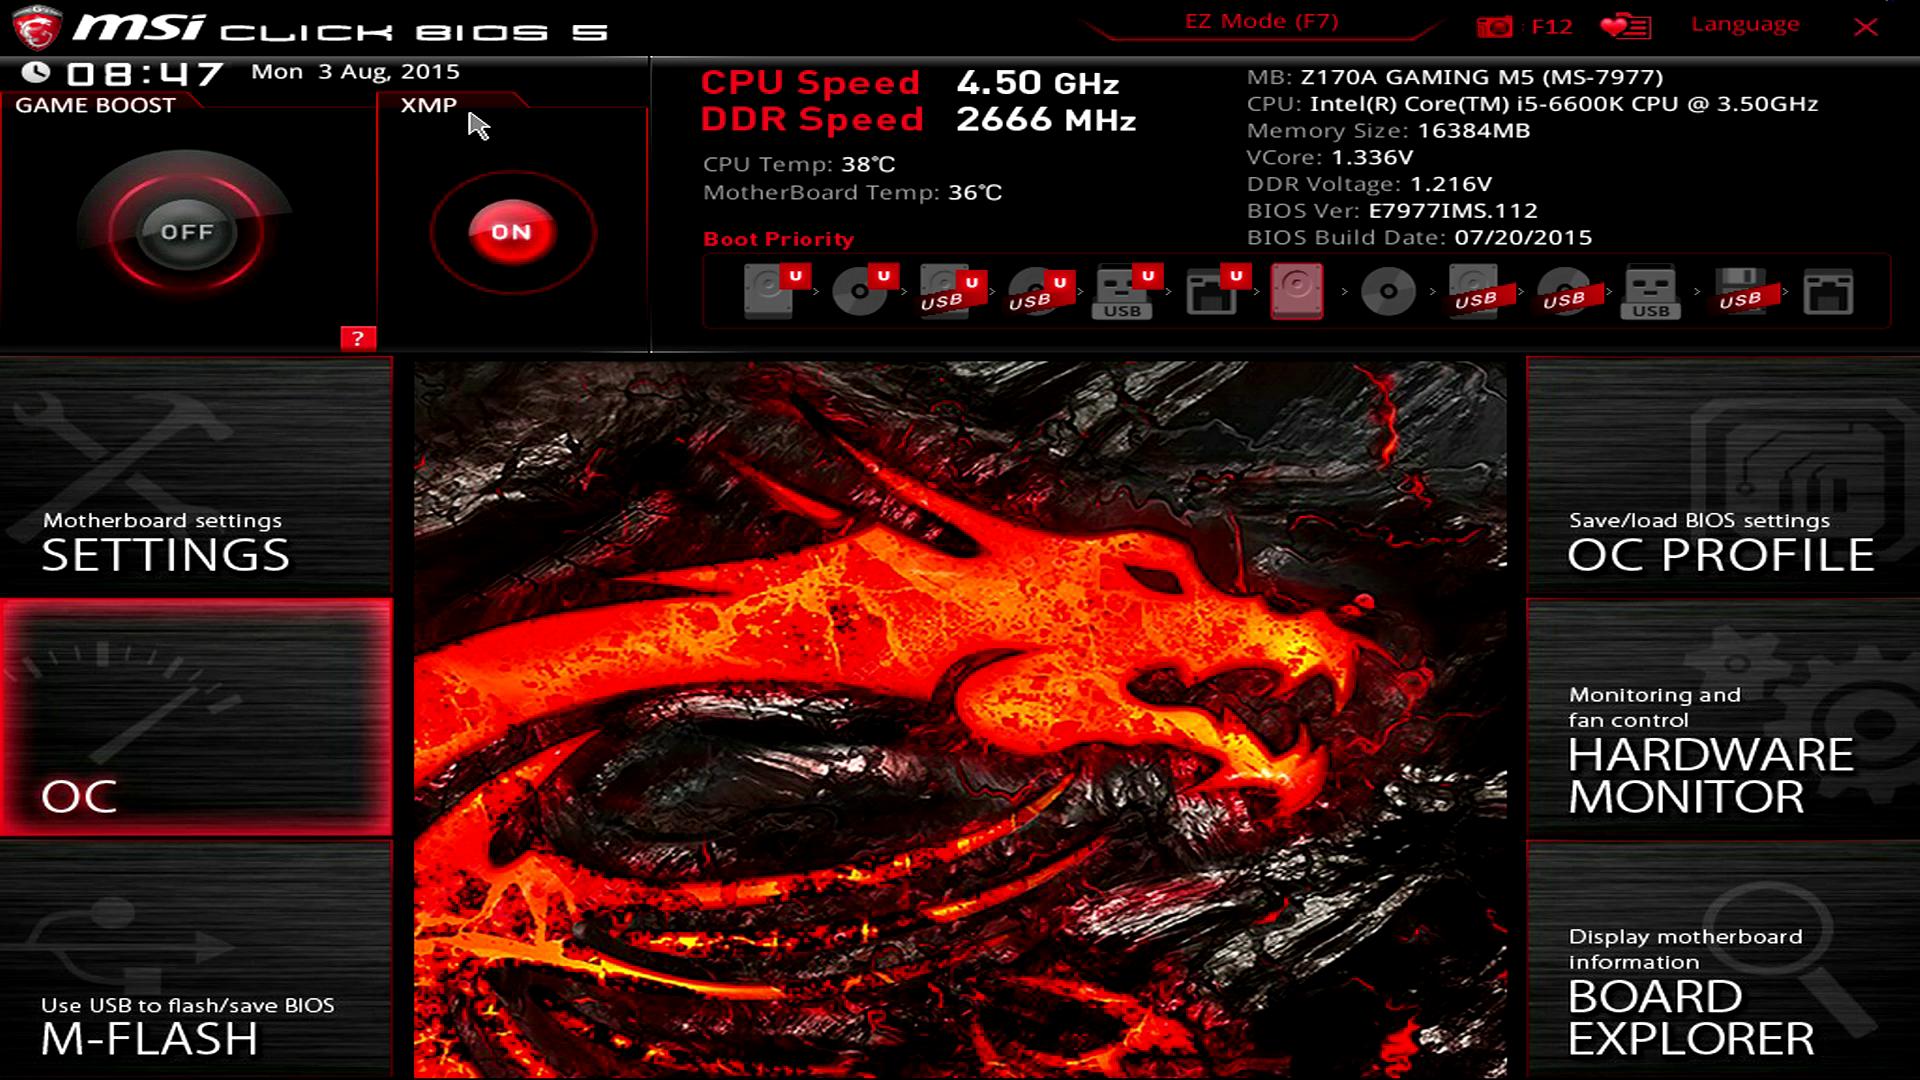 MSI Z170A Gaming M5 | Expert Reviews